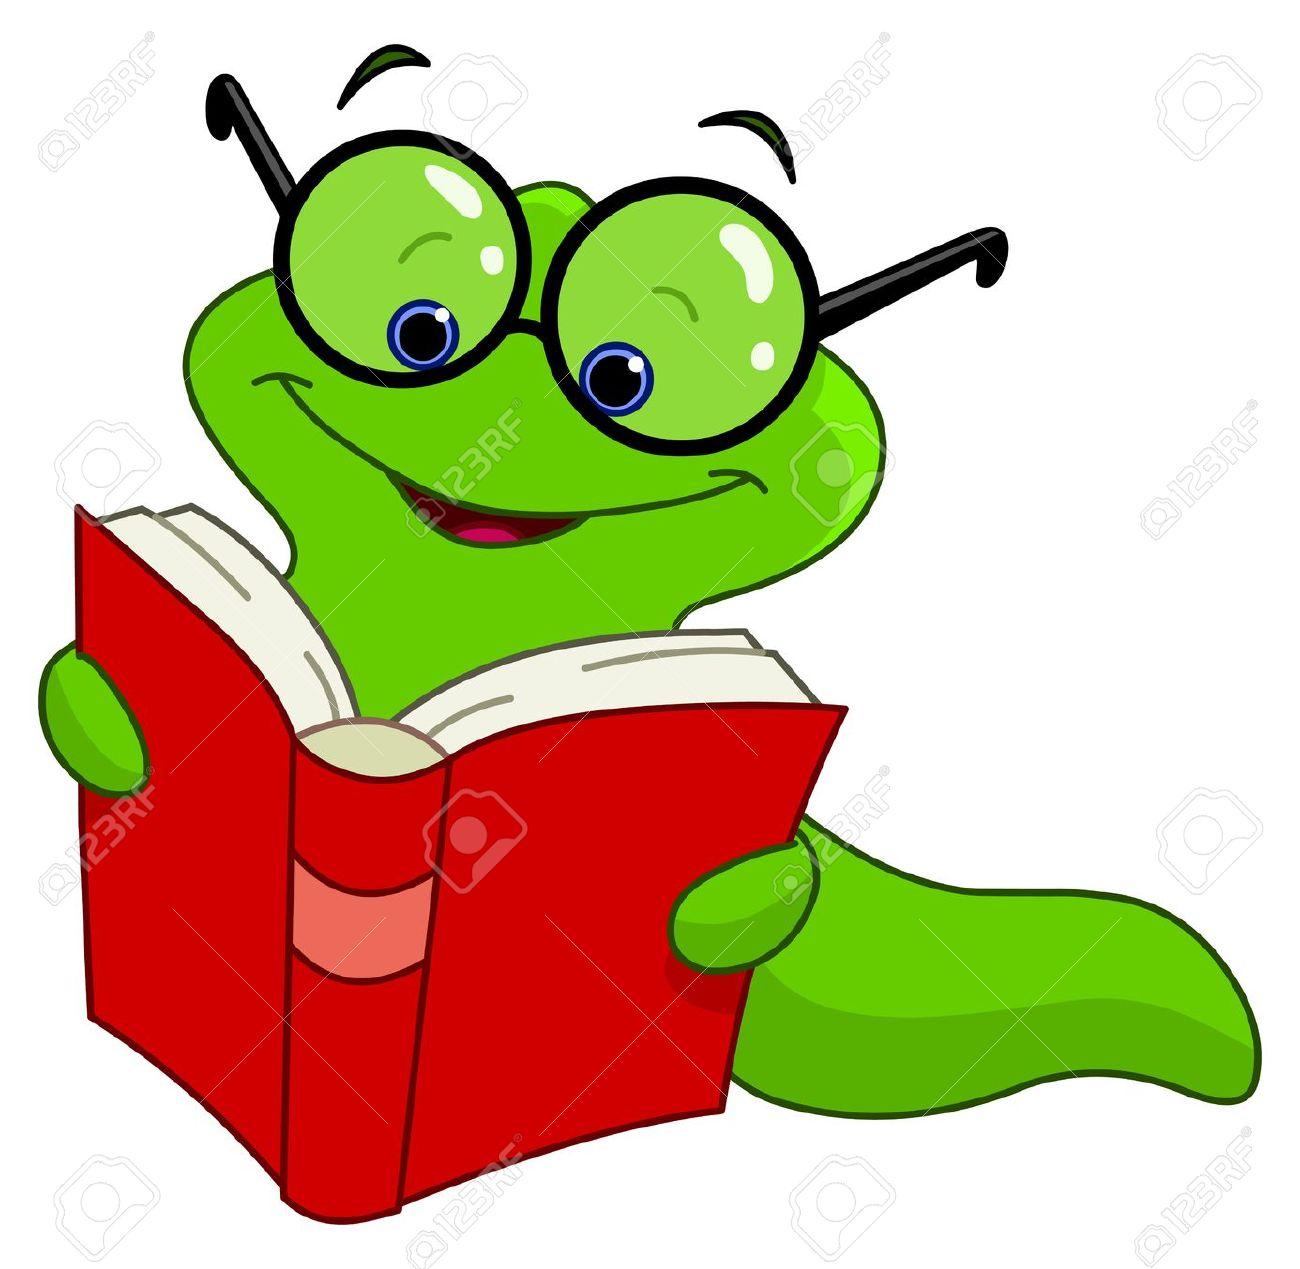 book worm clip art. book worm: Book worm